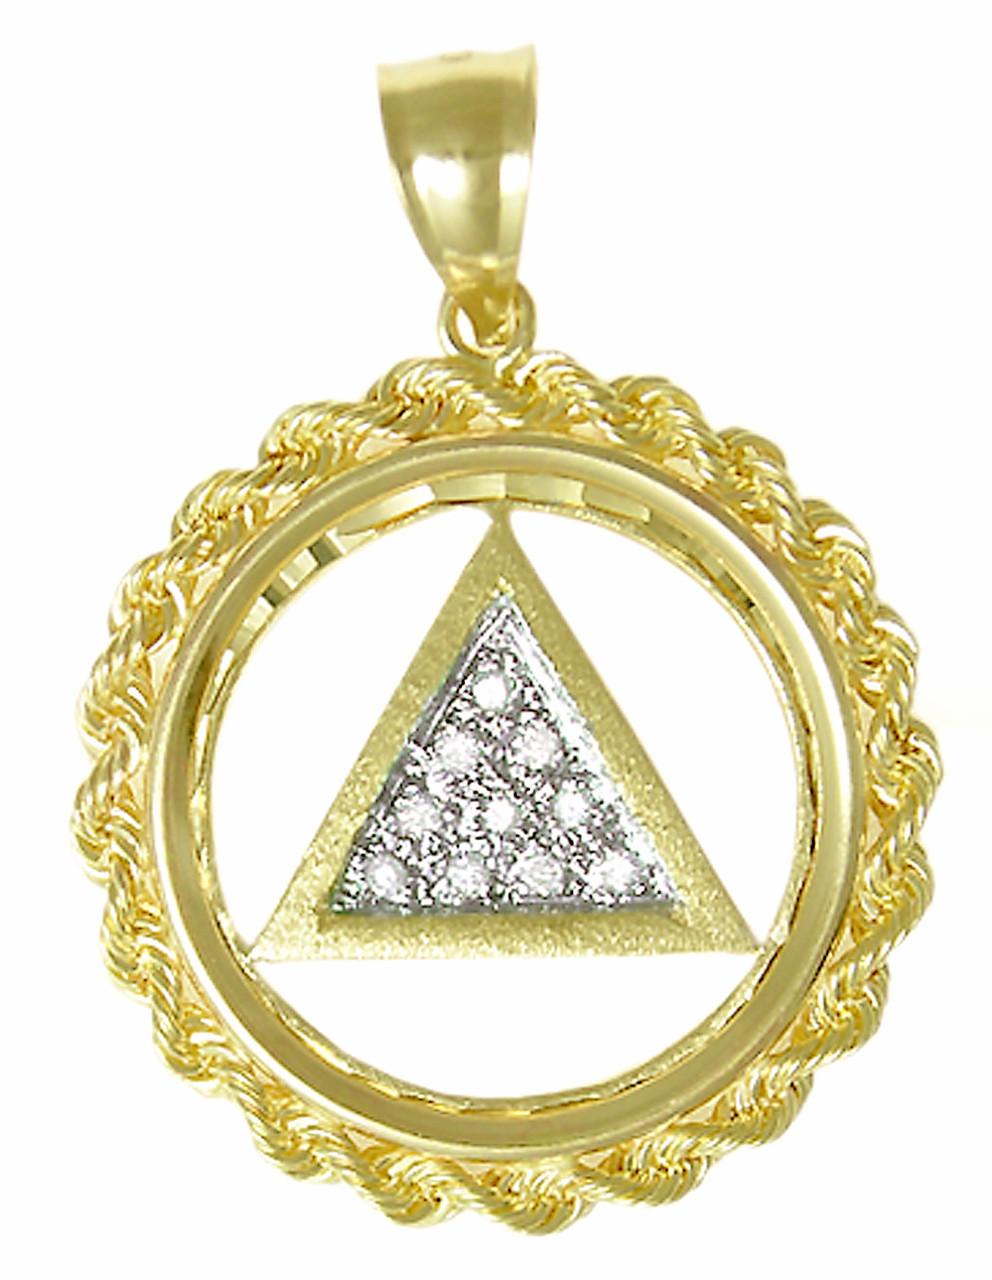 Style 36 2 14k gold aa symbol pendant rope circle w10 1pt style 36 2 14k gold aa symbol pendant rope circle w buycottarizona